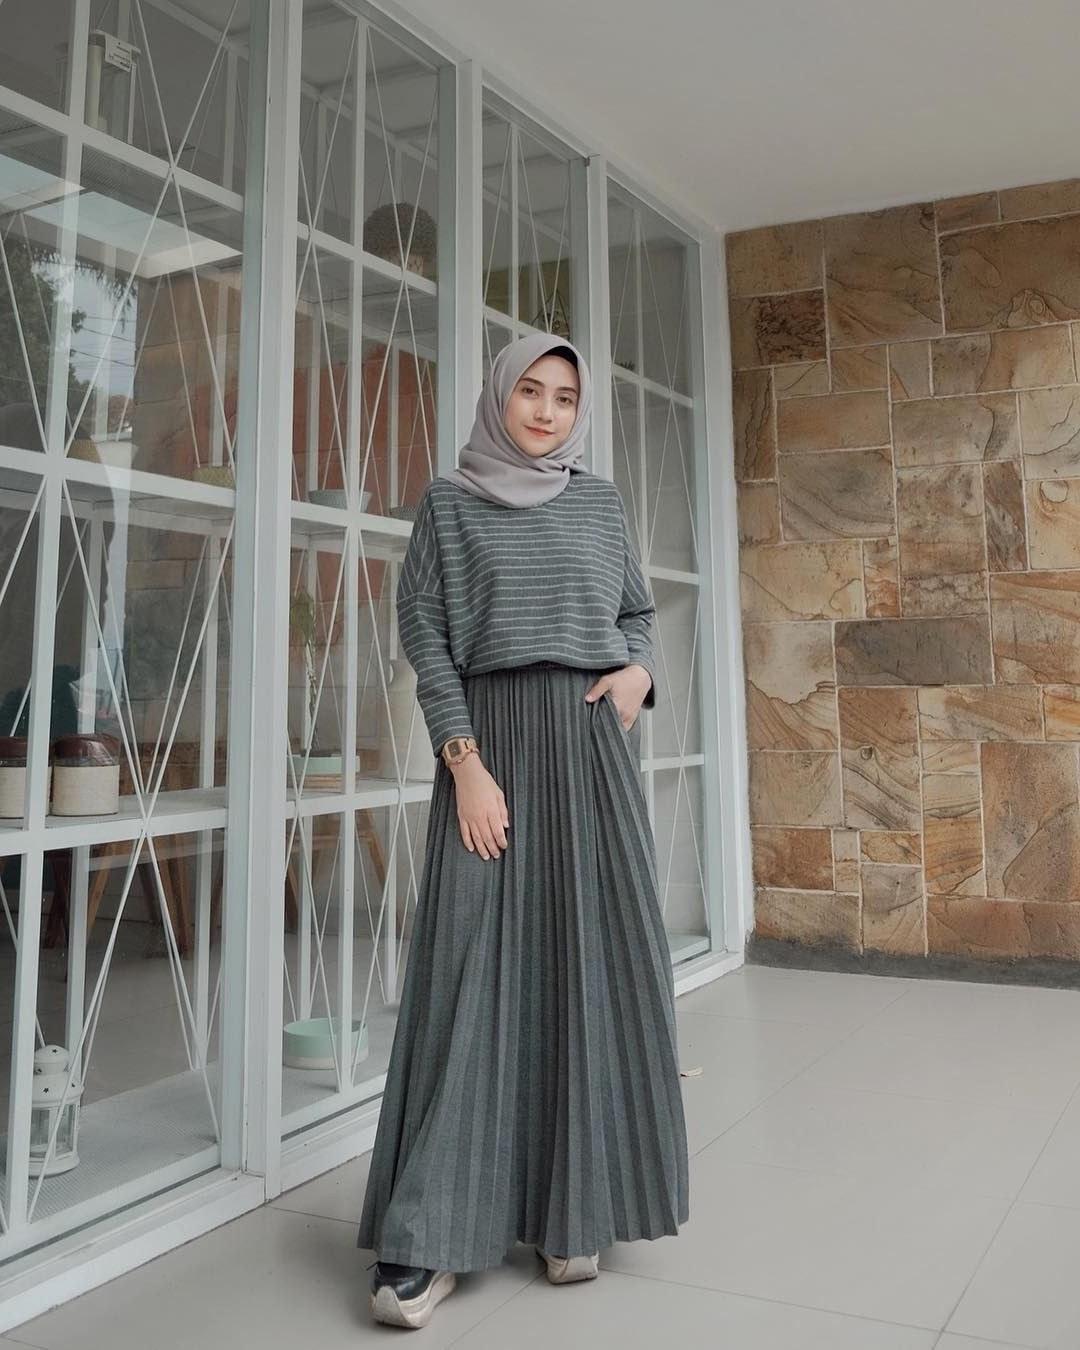 Design Ootd Baju Lebaran Remaja 2020 3ldq Baju Muslim Lebaran Terbaru 2019